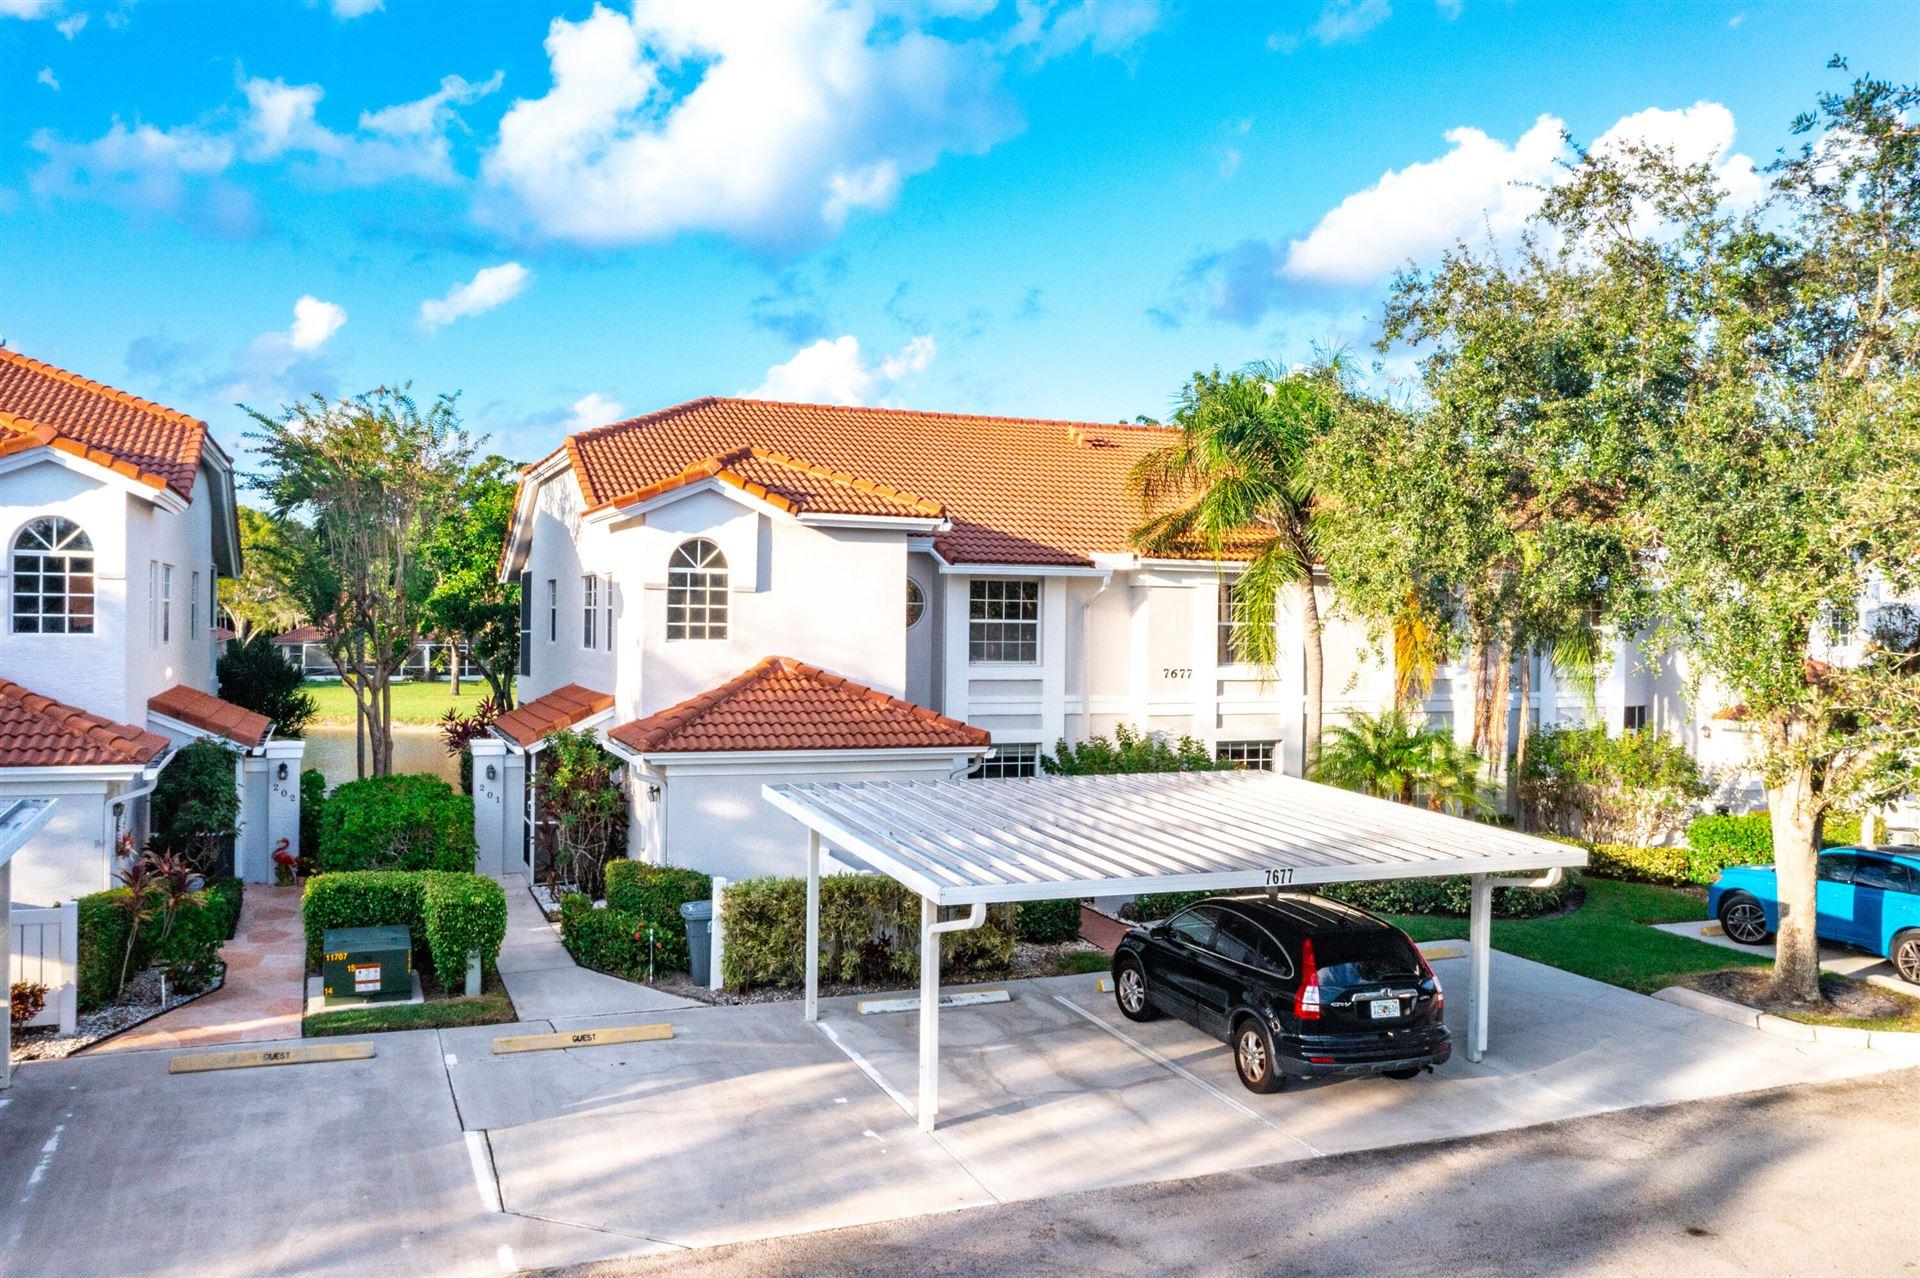 7677 Springwater 201 Place #201, Boynton Beach, FL 33437 - MLS#: RX-10753622